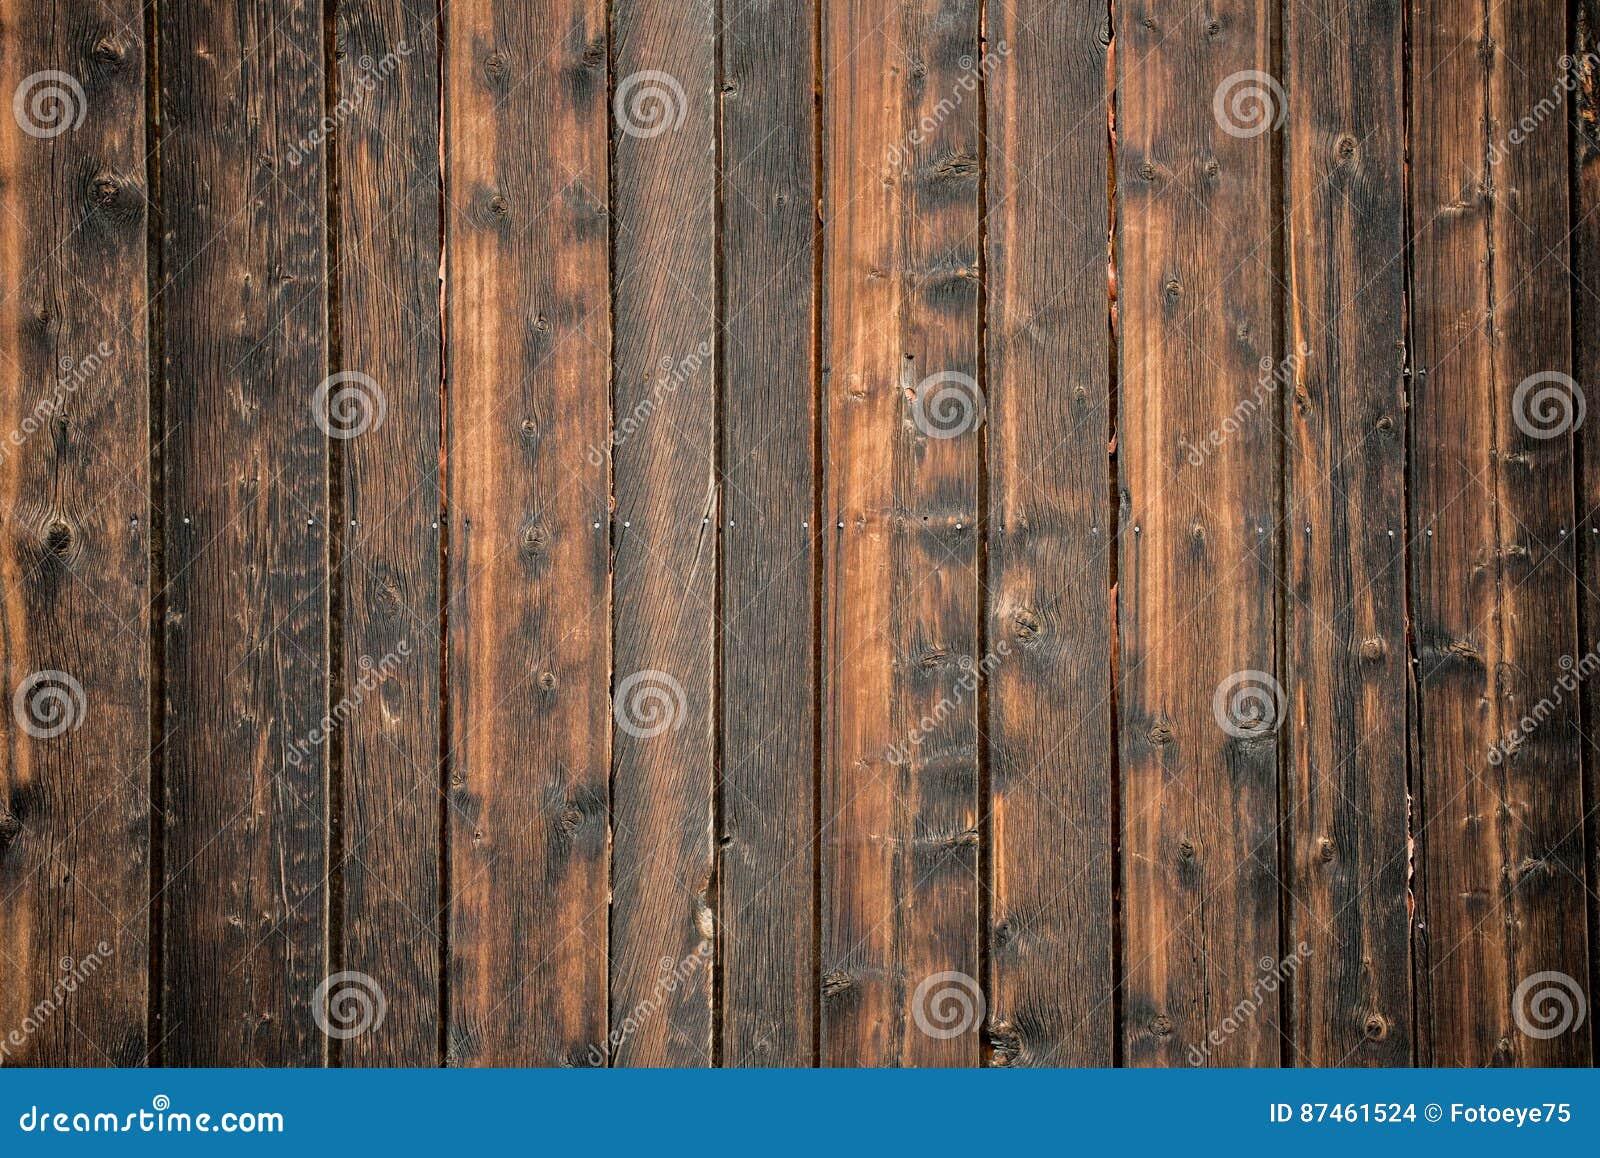 Vieja textura de madera occidental del fondo del granero